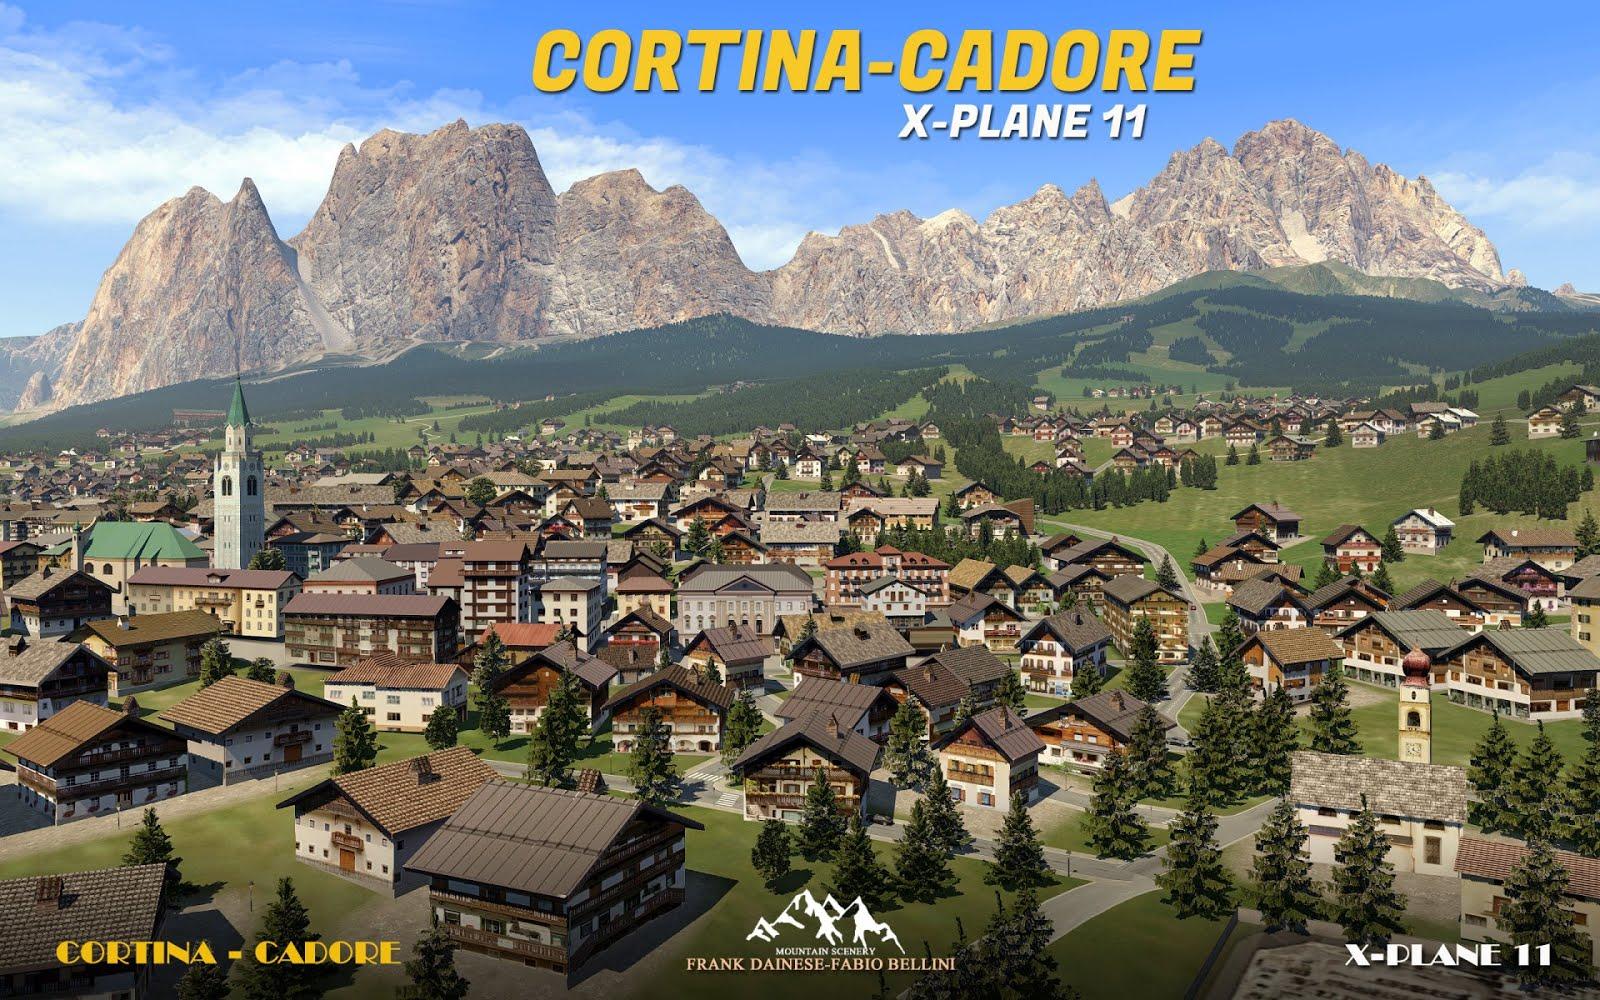 CORTINA-CADORE